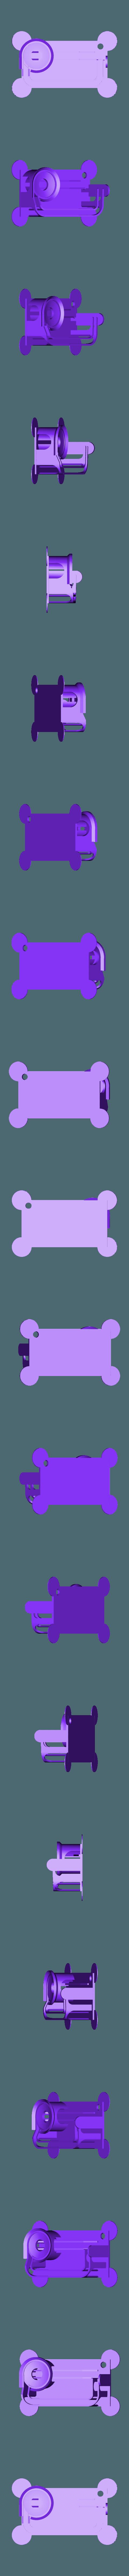 "Track_Bowl.stl Download free STL file Marblevator ""Mini"", Bowl Edition • 3D printer object, gzumwalt"